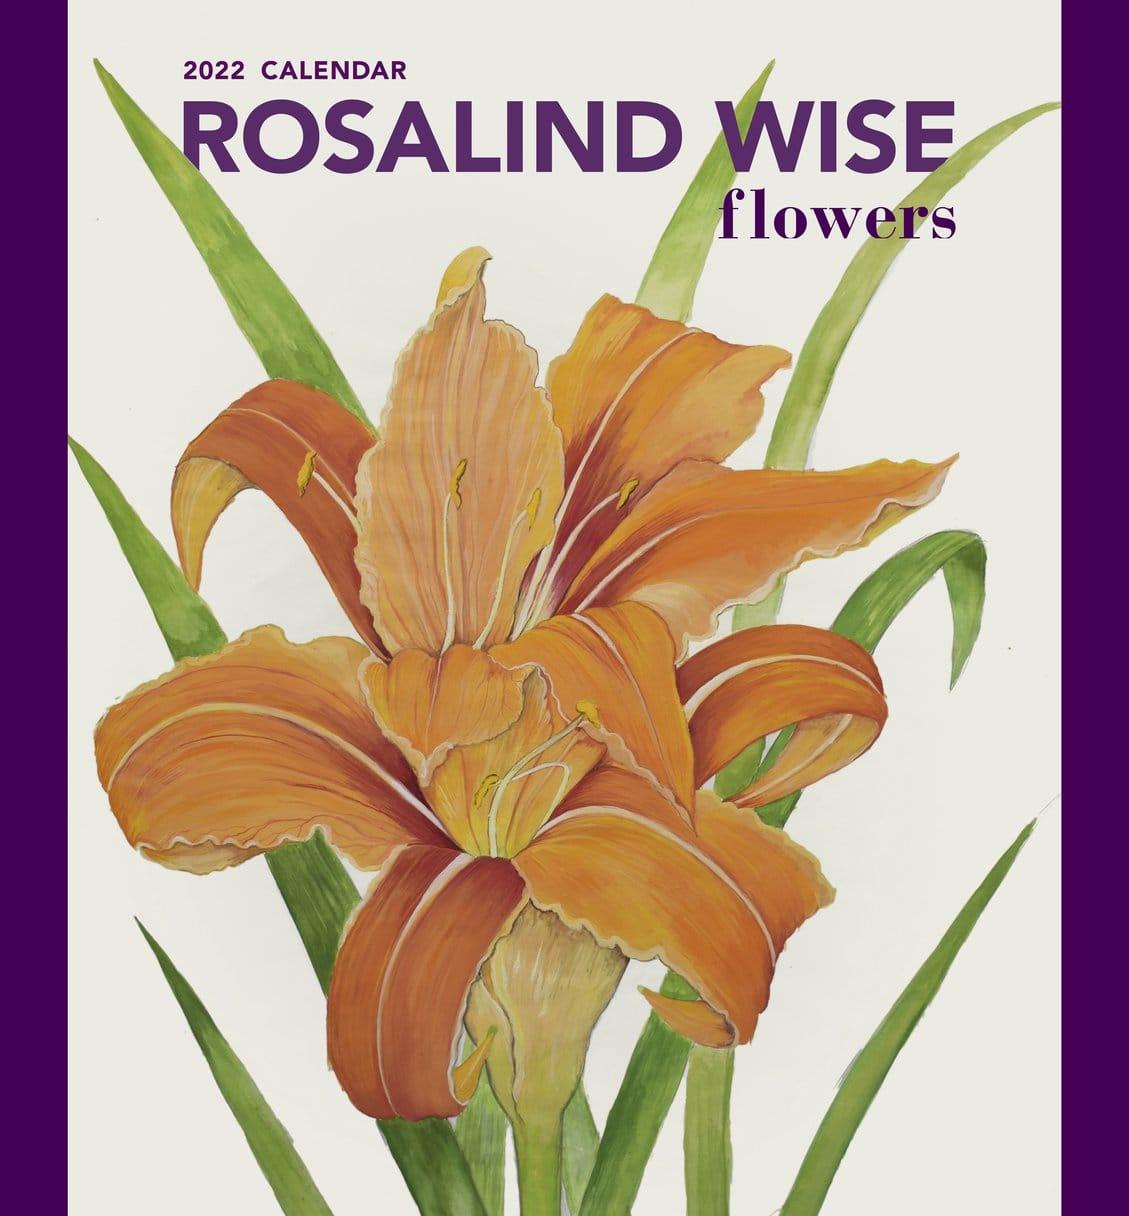 Rosalind Wise Flowers 2022 Calendar